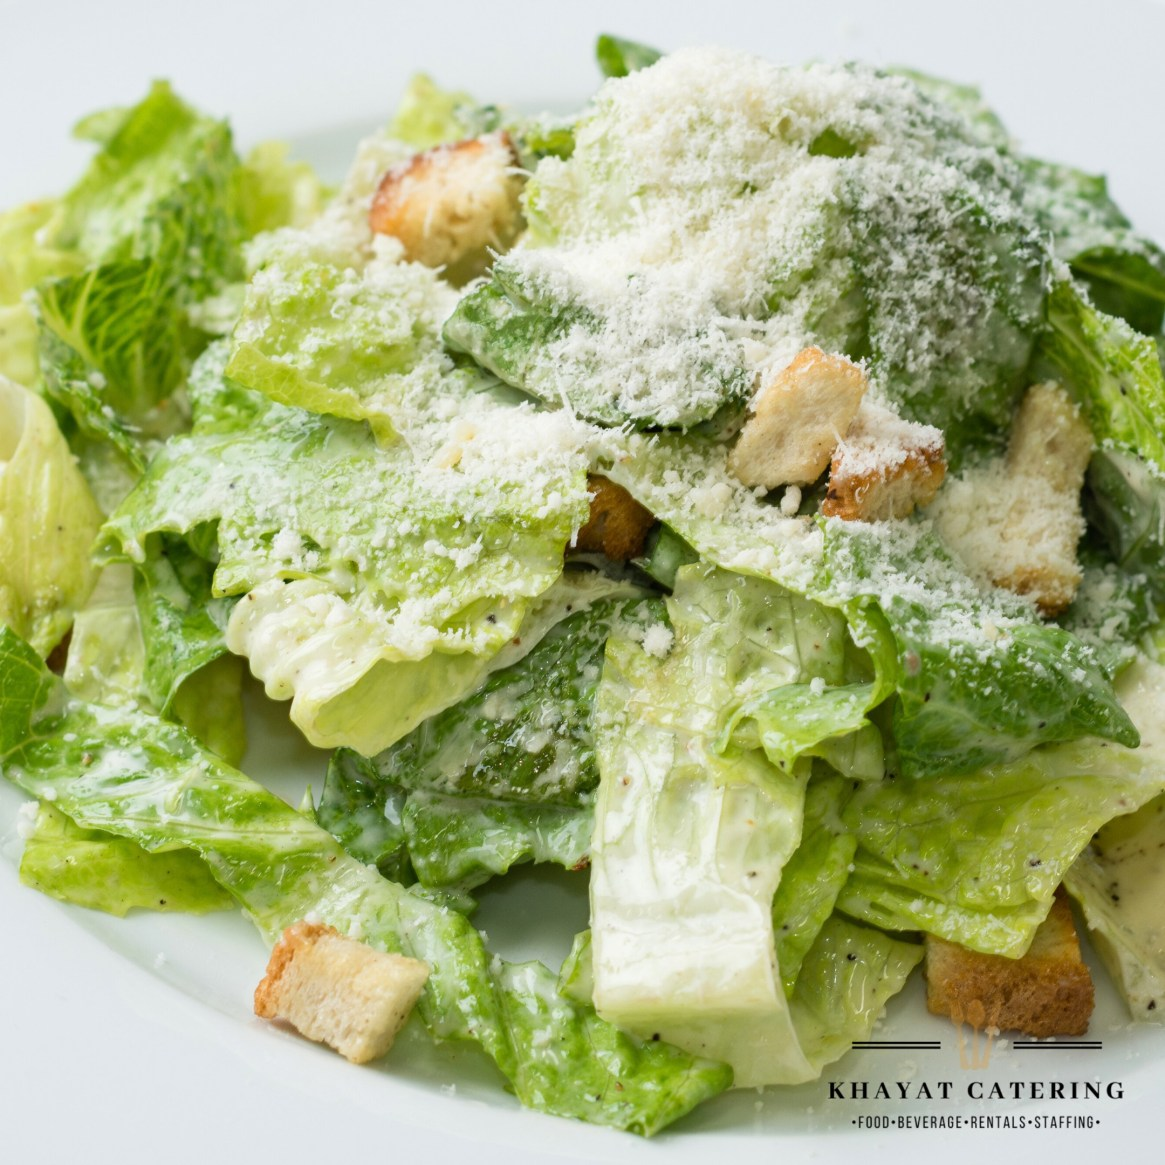 Khayat Catering caesar salad